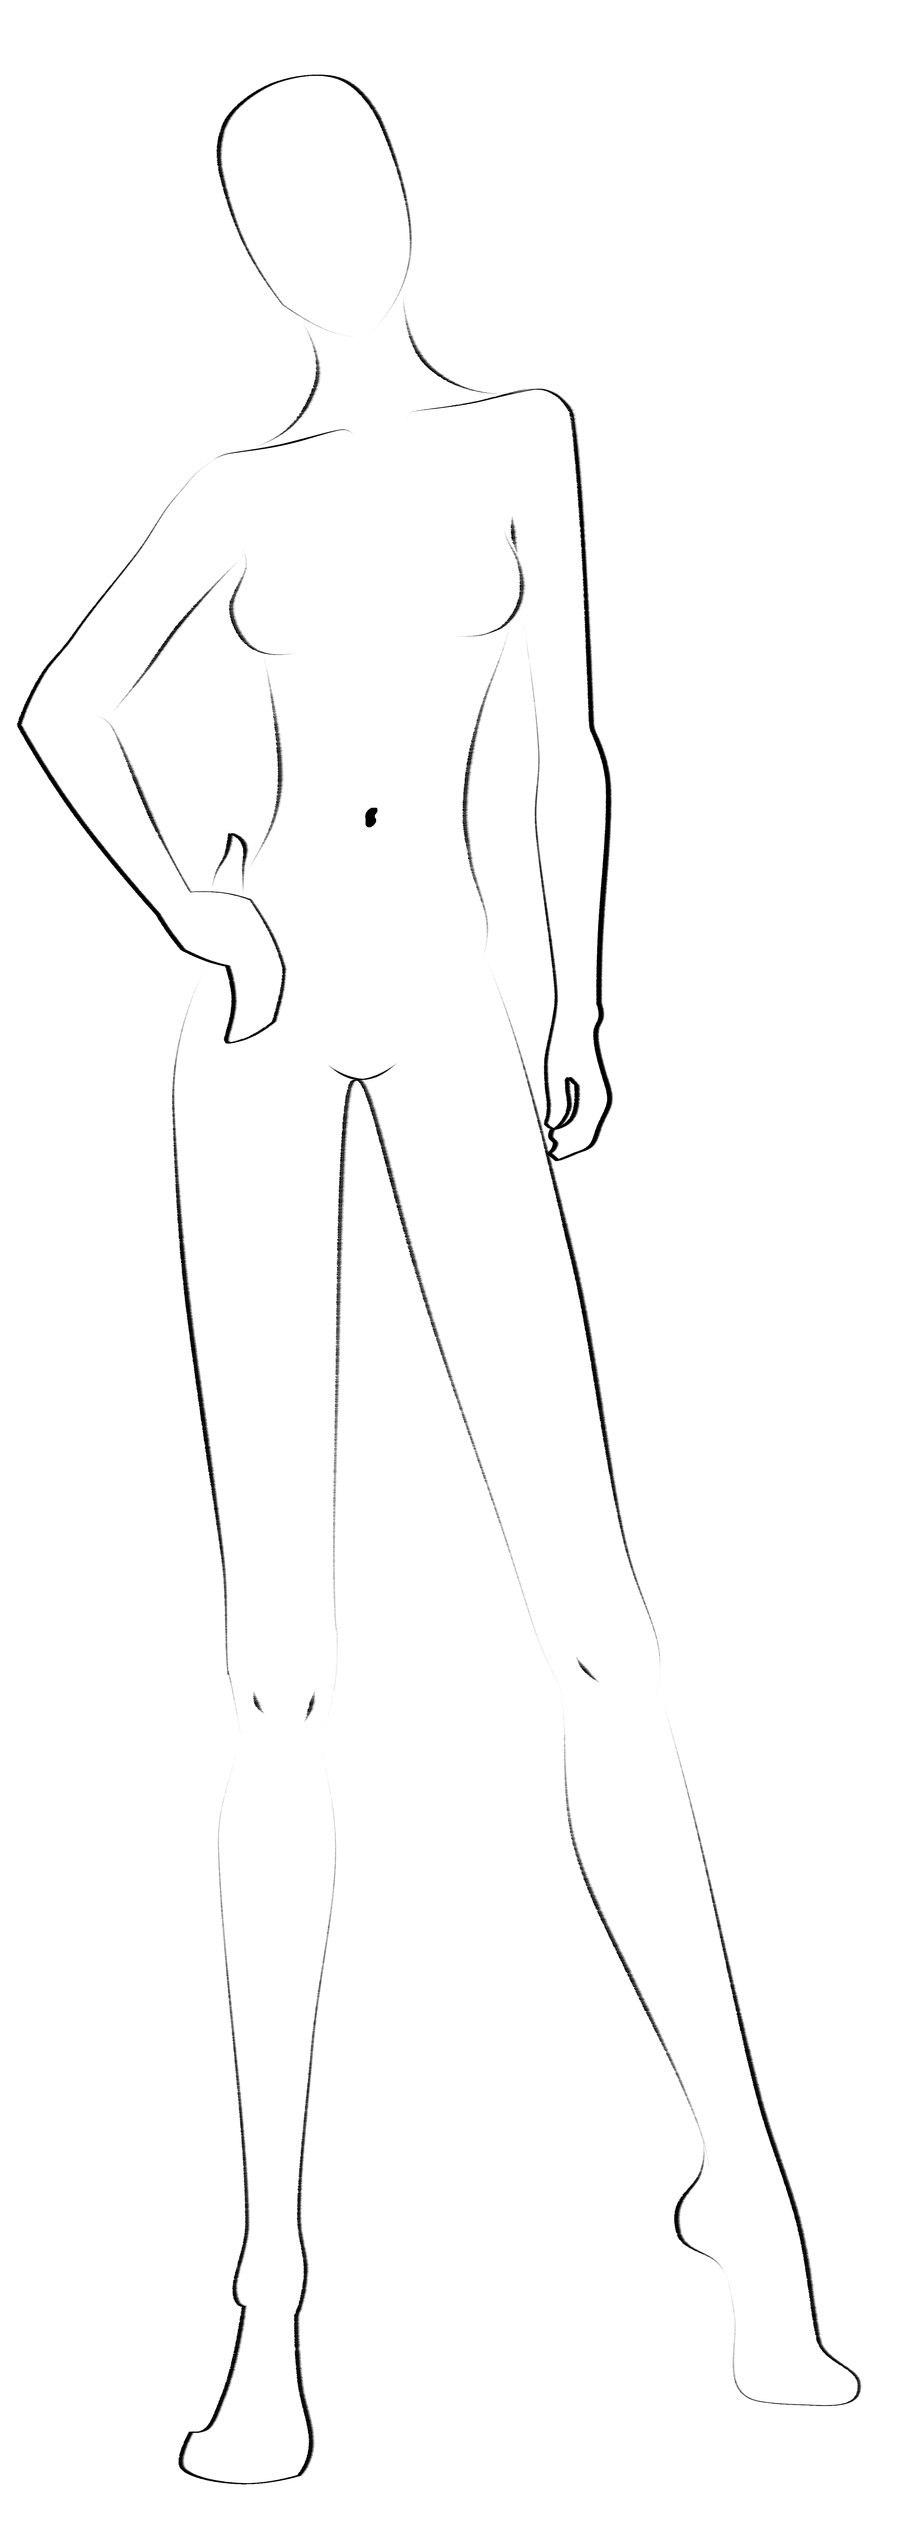 Fashion Templates   Free Designs Inspiration Jpg Format Regarding Blank Model Sketch Template